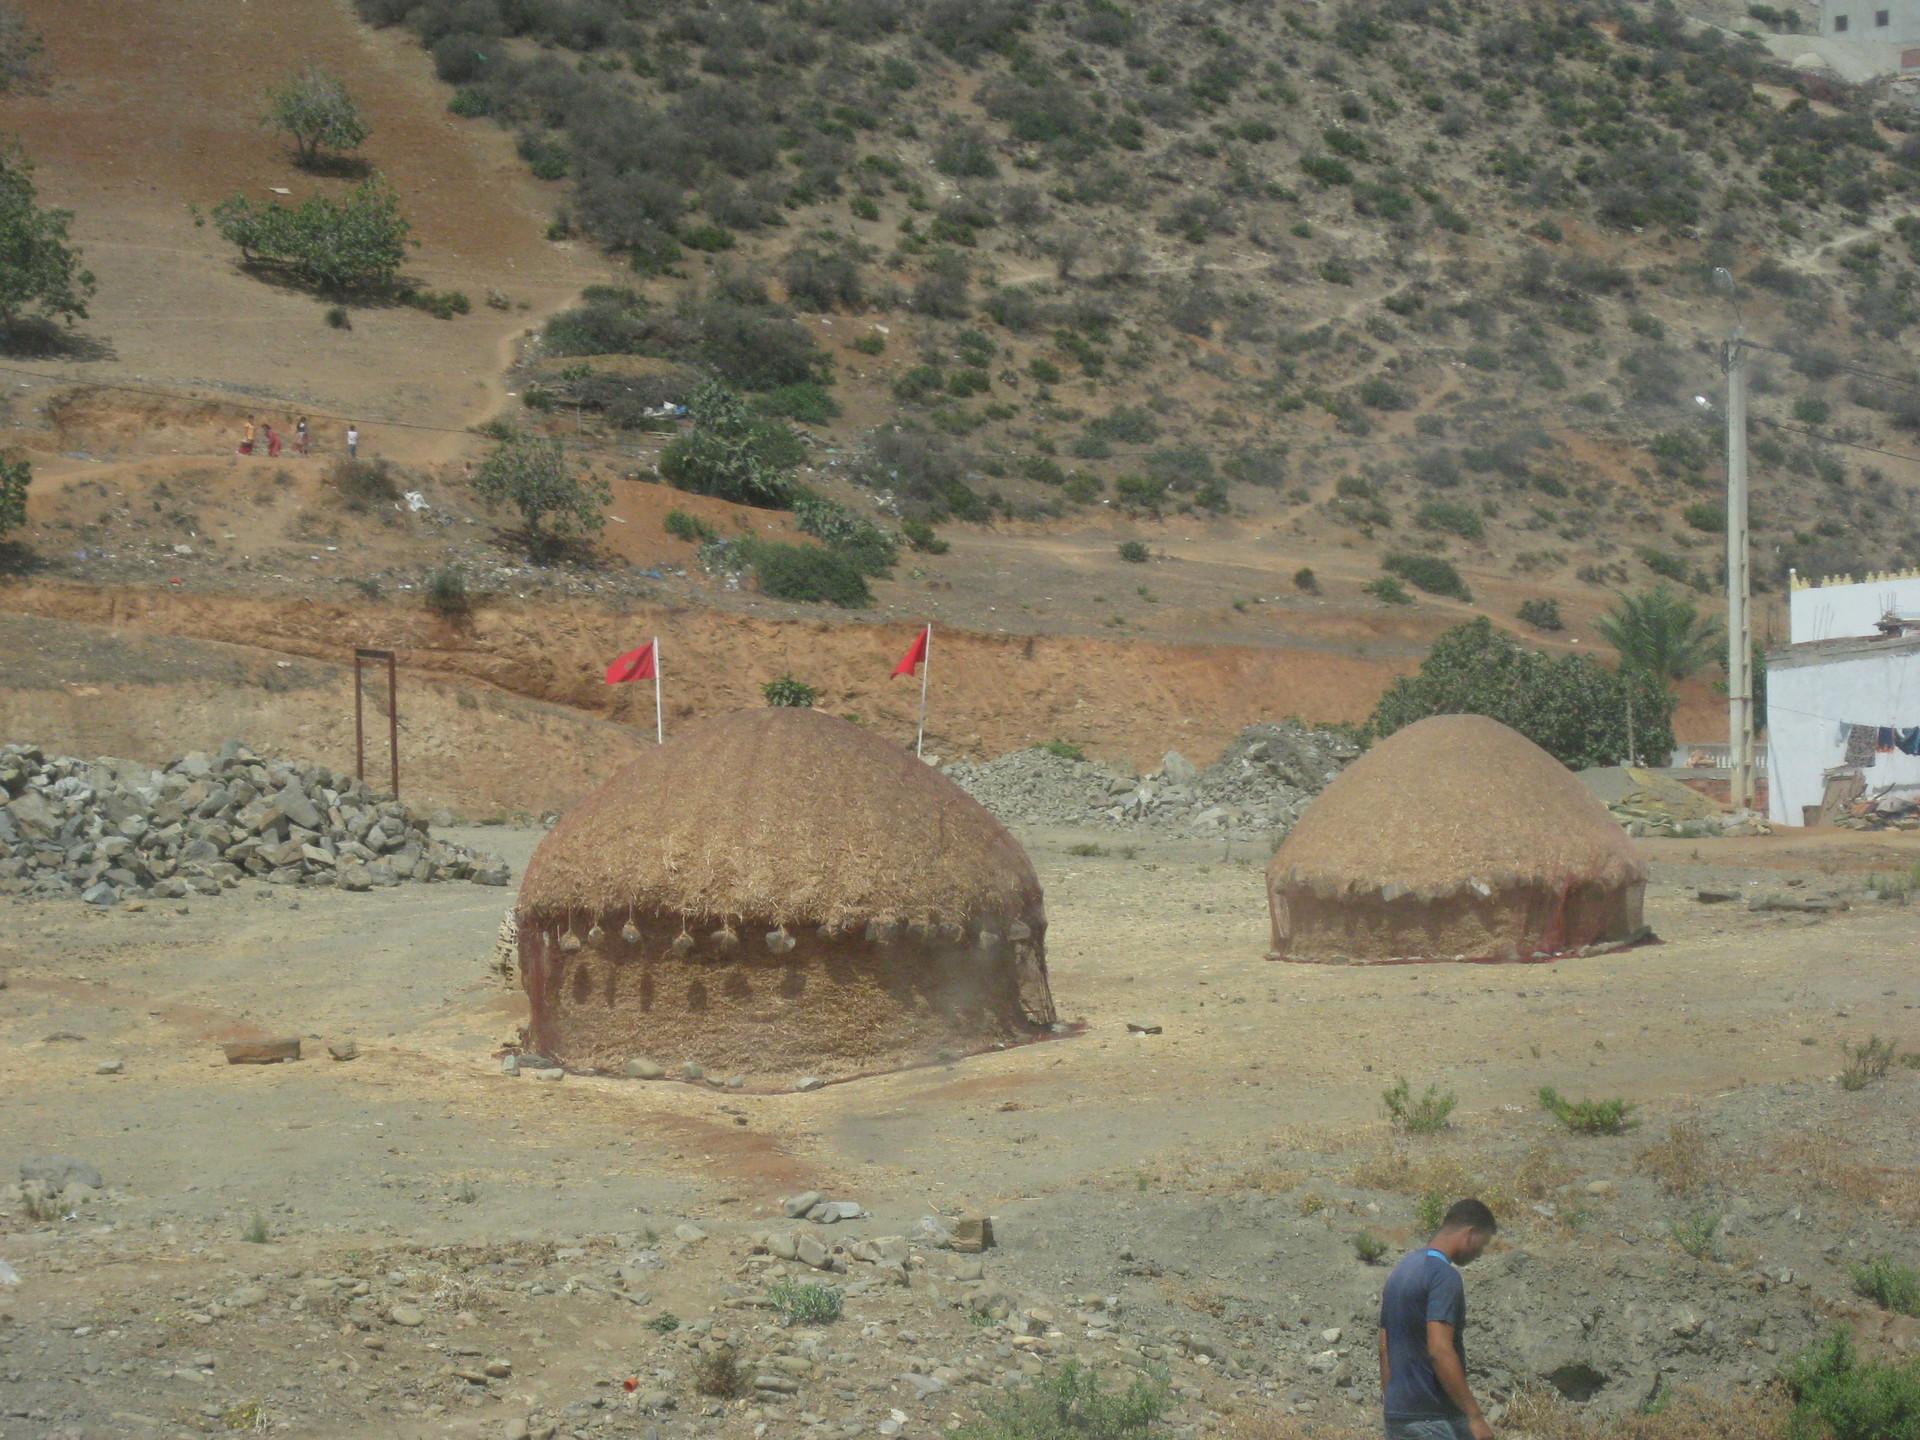 targha-morocco-33e4317d68deeb7605b33b6ec